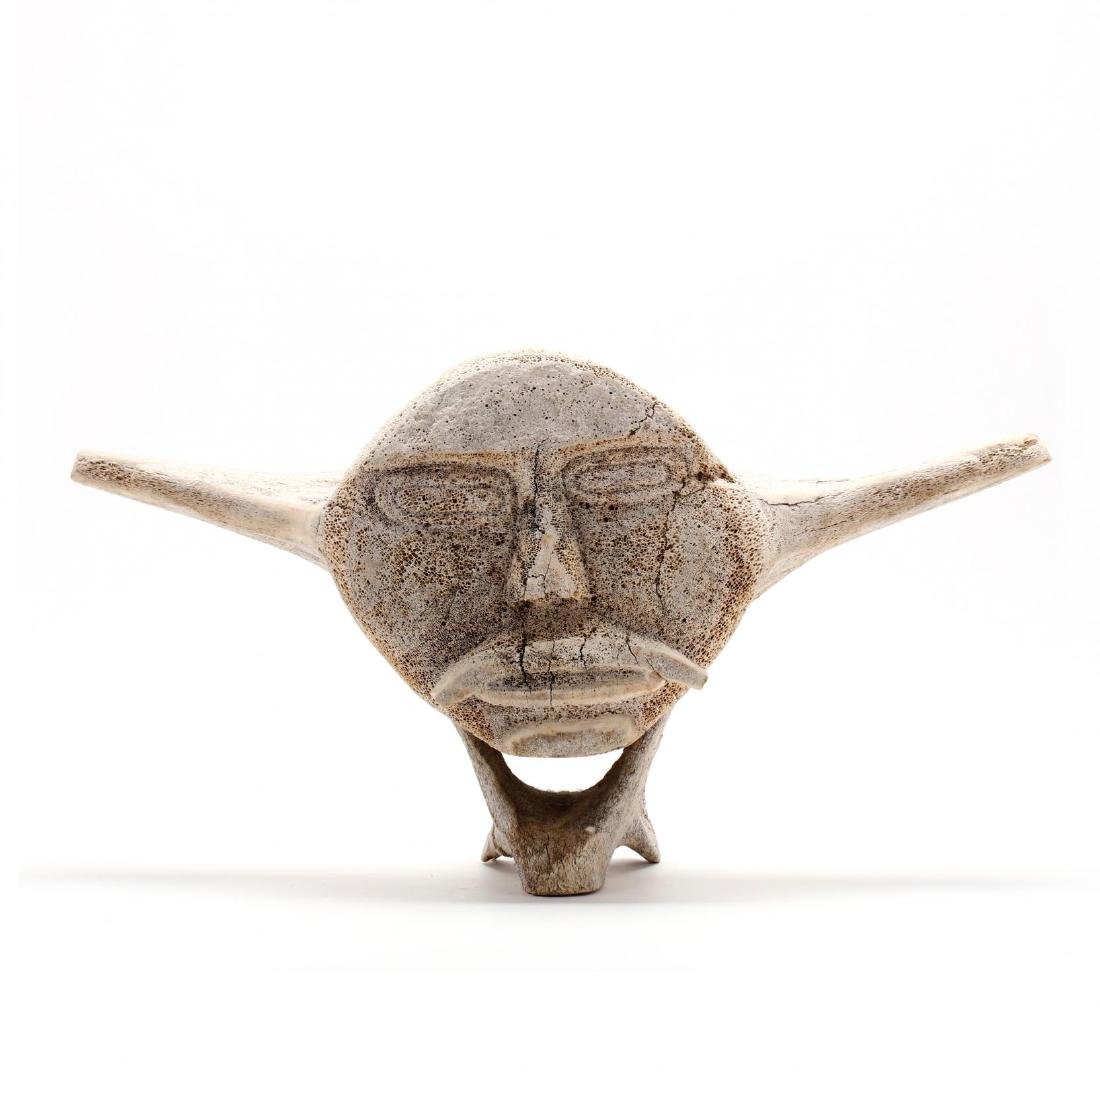 Large Inuit Carved Whale Bone Vertebrae